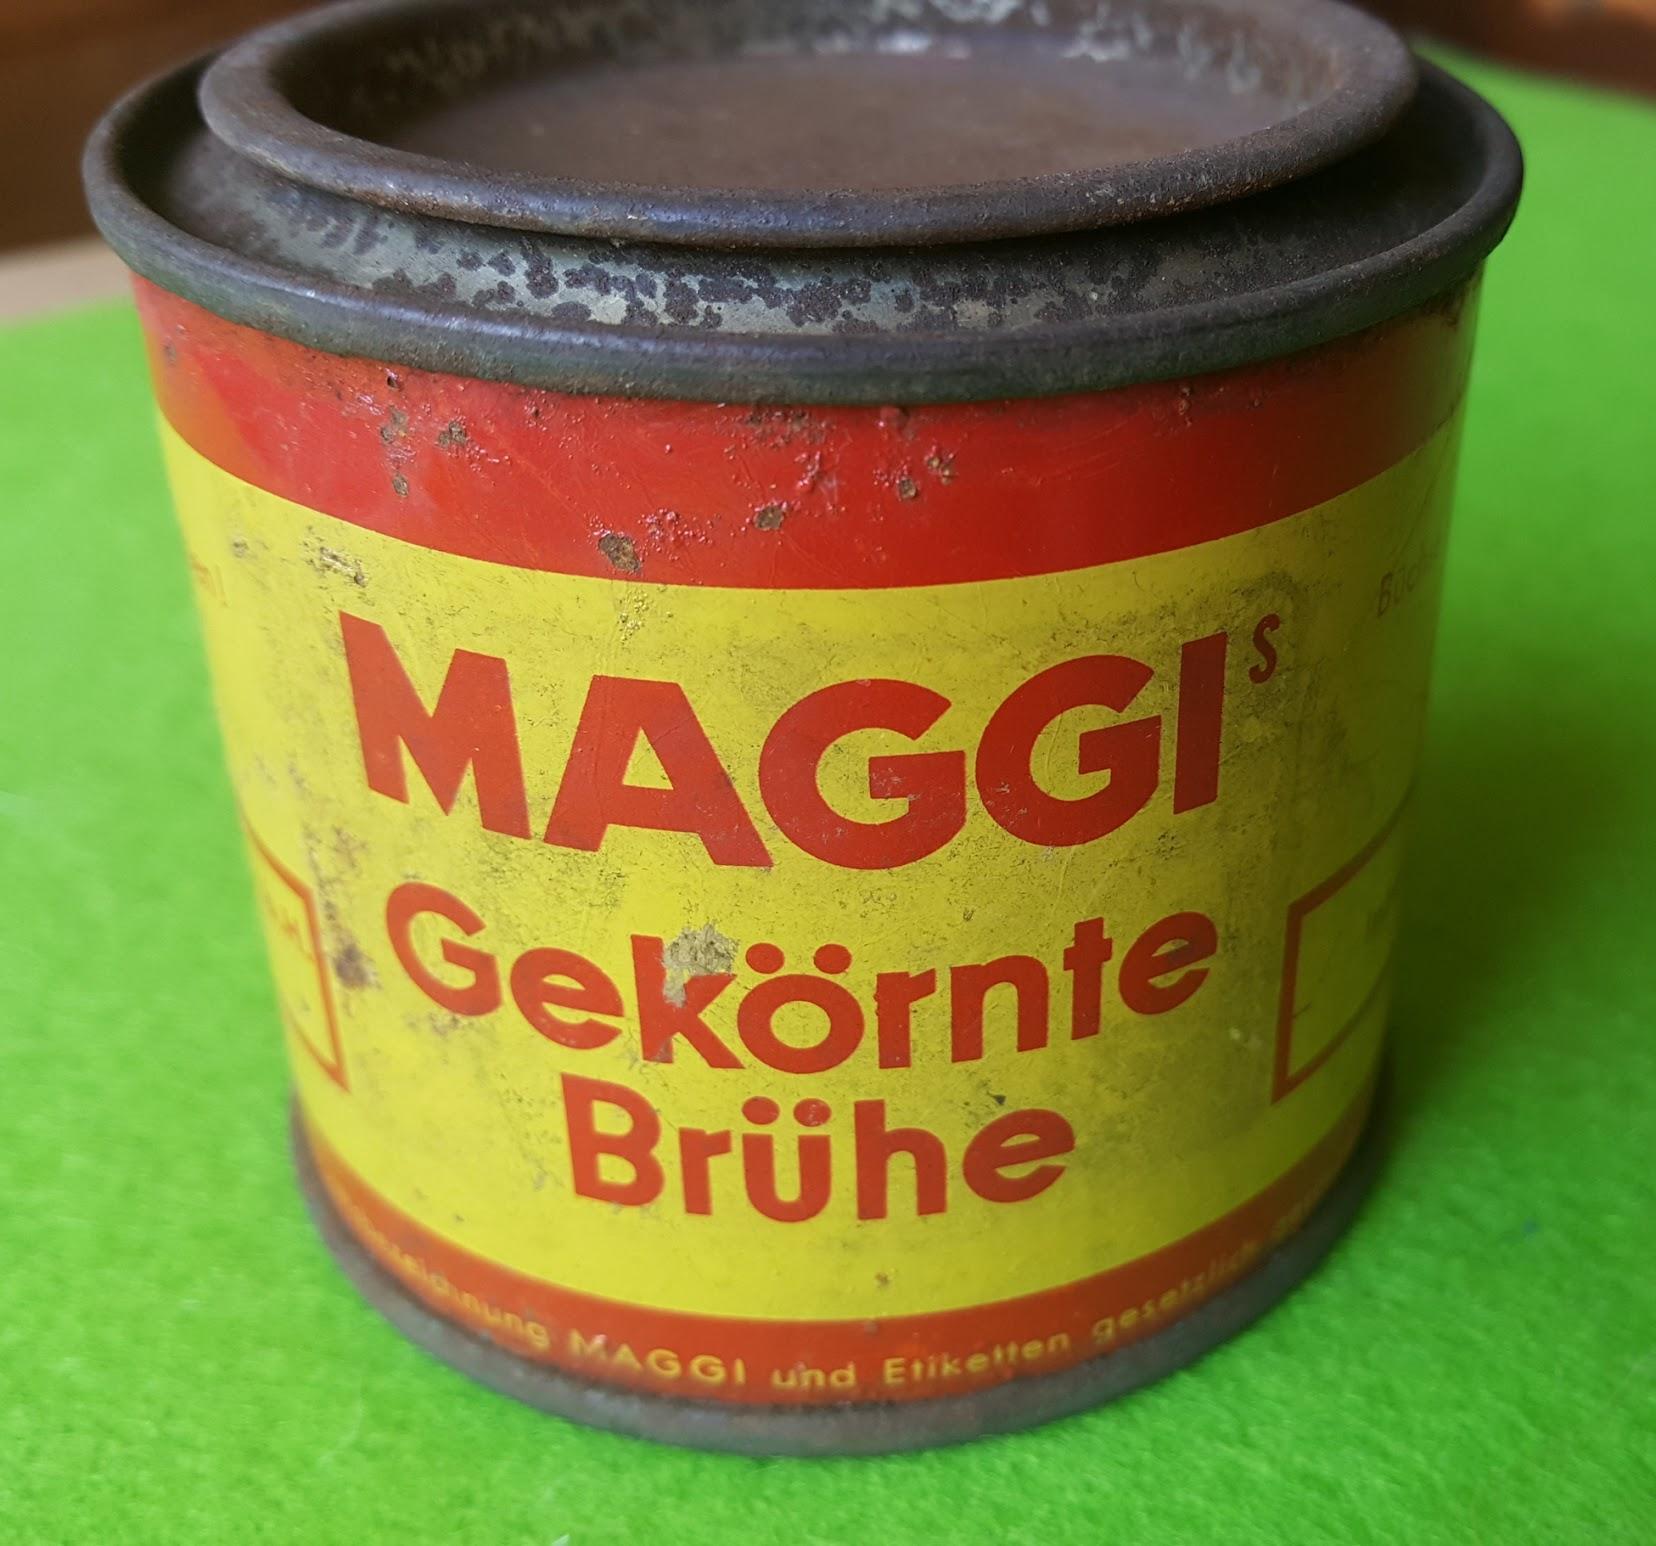 Maggi Gekörnte Brühe Dose